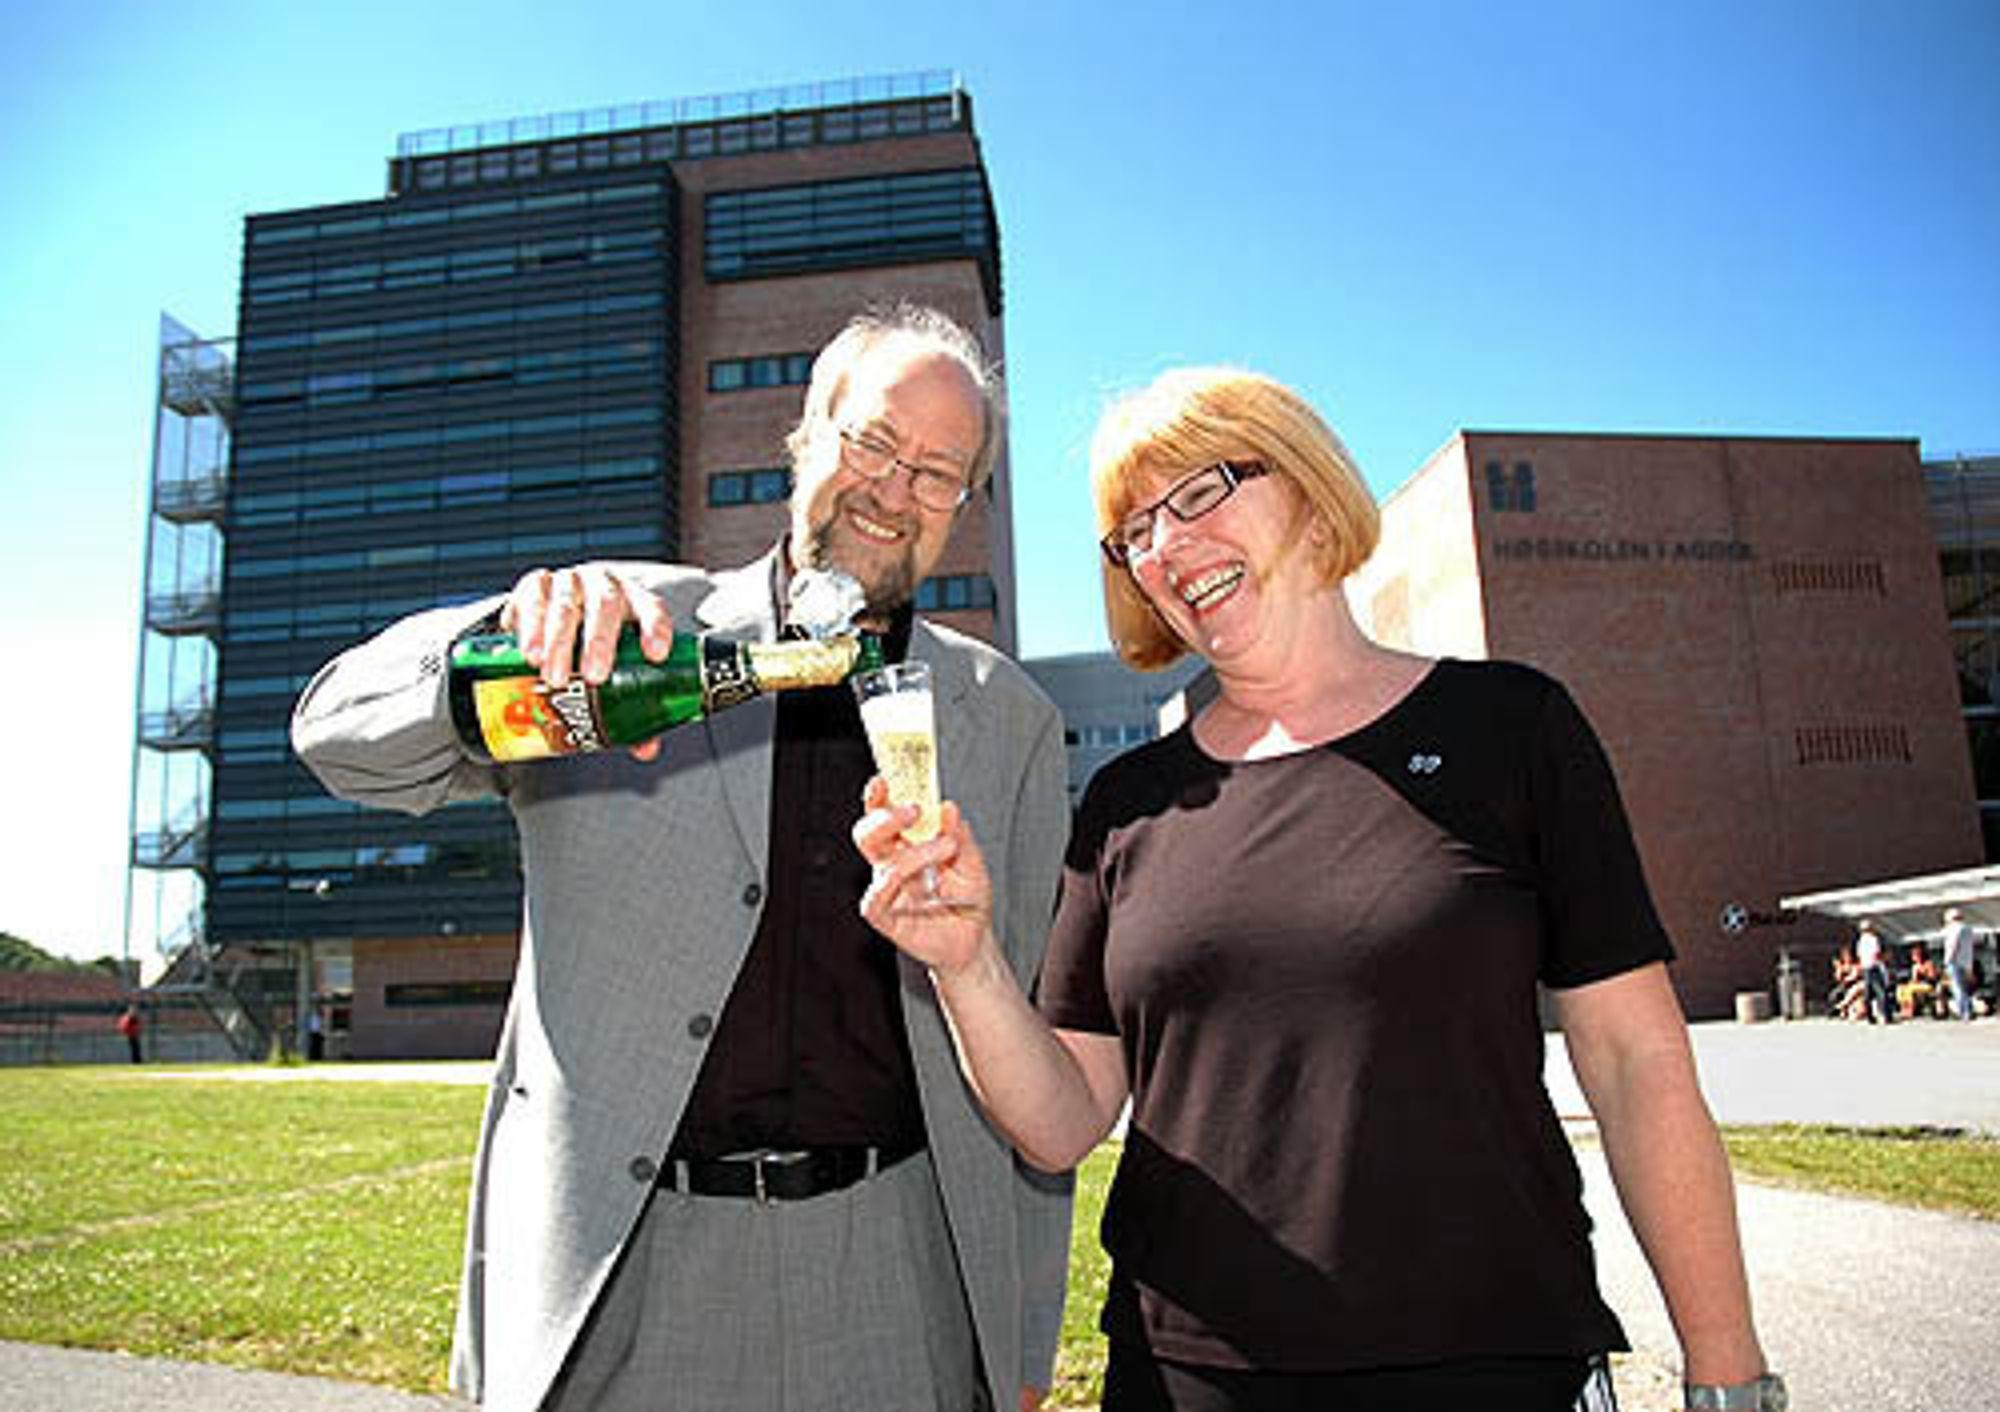 FORNØYD: Både ex-rektor Ernst Håkon Jahr og nytilsatt rektor Torunn Lauvdal er strålende fornøyd med at Høgskolen i Agder fra 1. september får universitetsstatus.